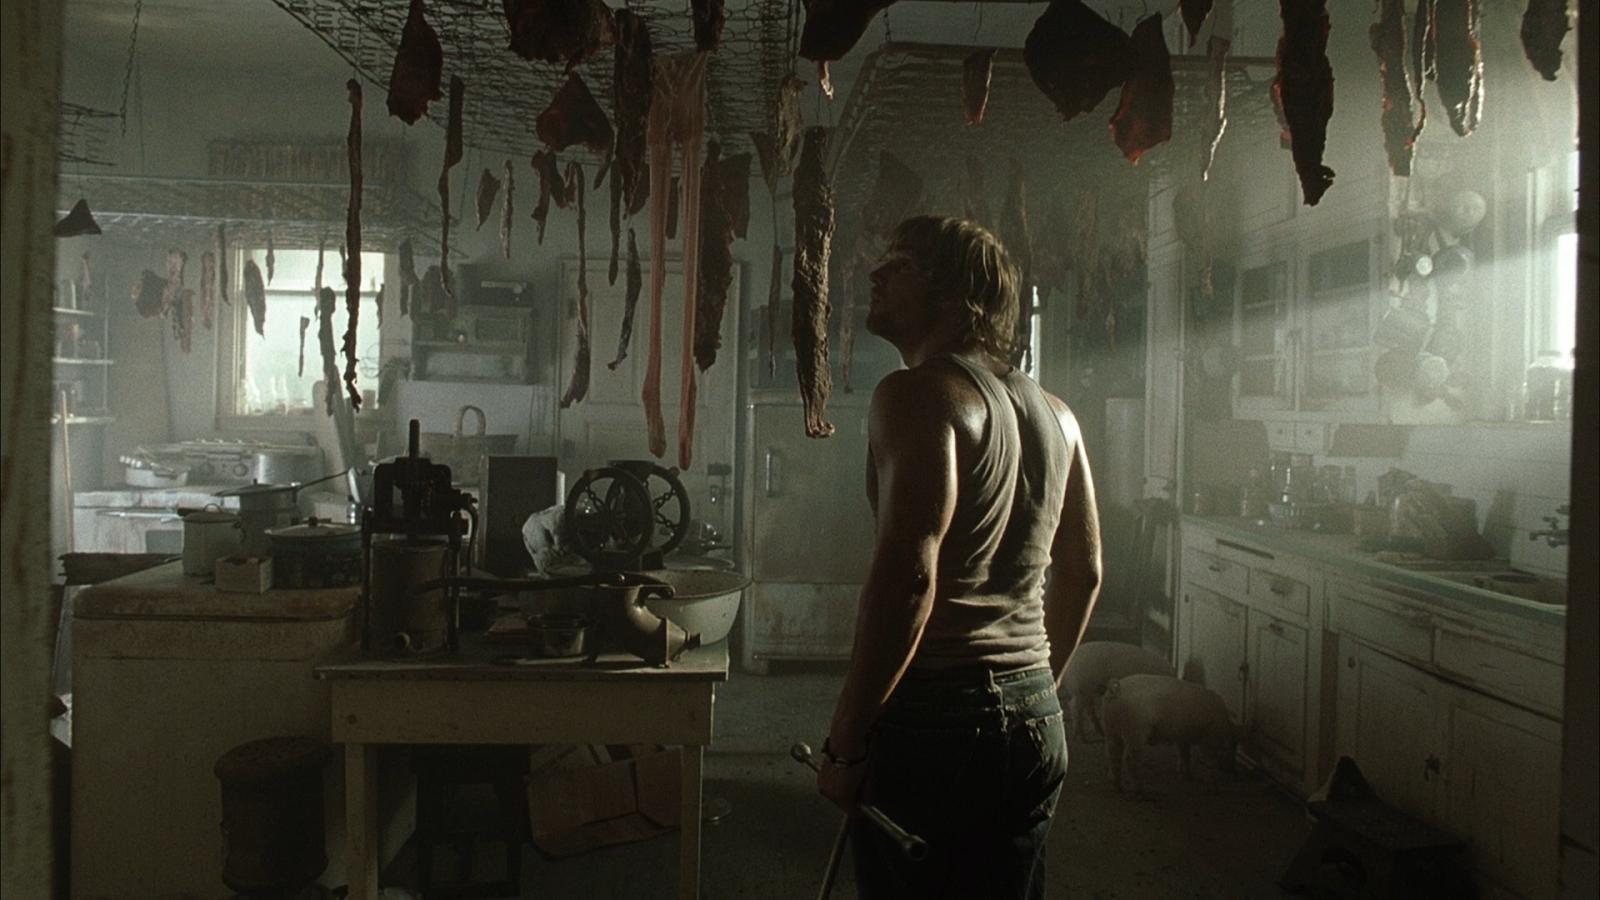 T-Shirt Leatherface horror teaxs chainsaw massacre film tot killer murder 666